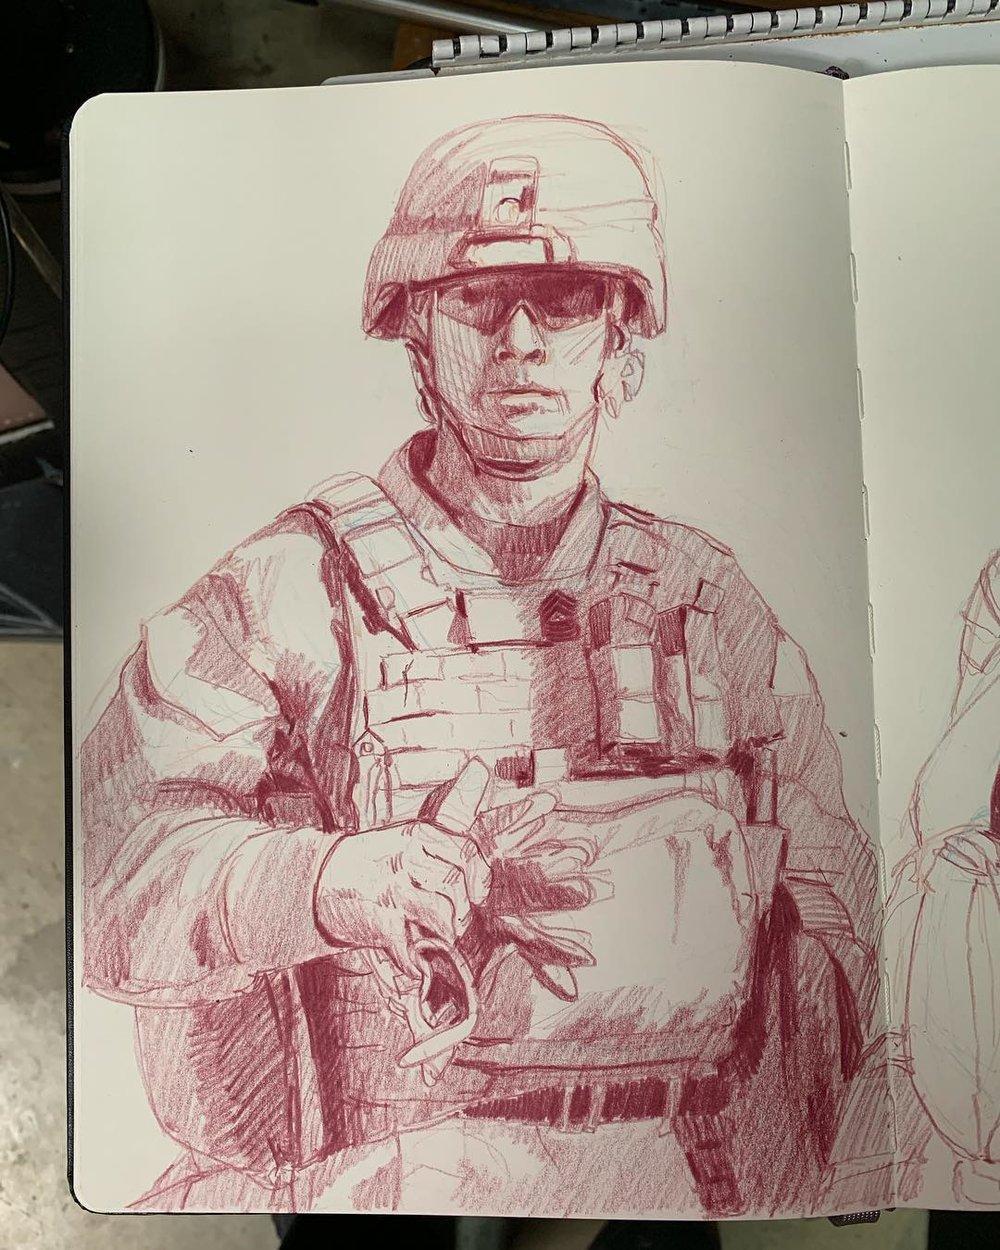 Sergeant Major Bull- 1st Battalion, 11th Marines